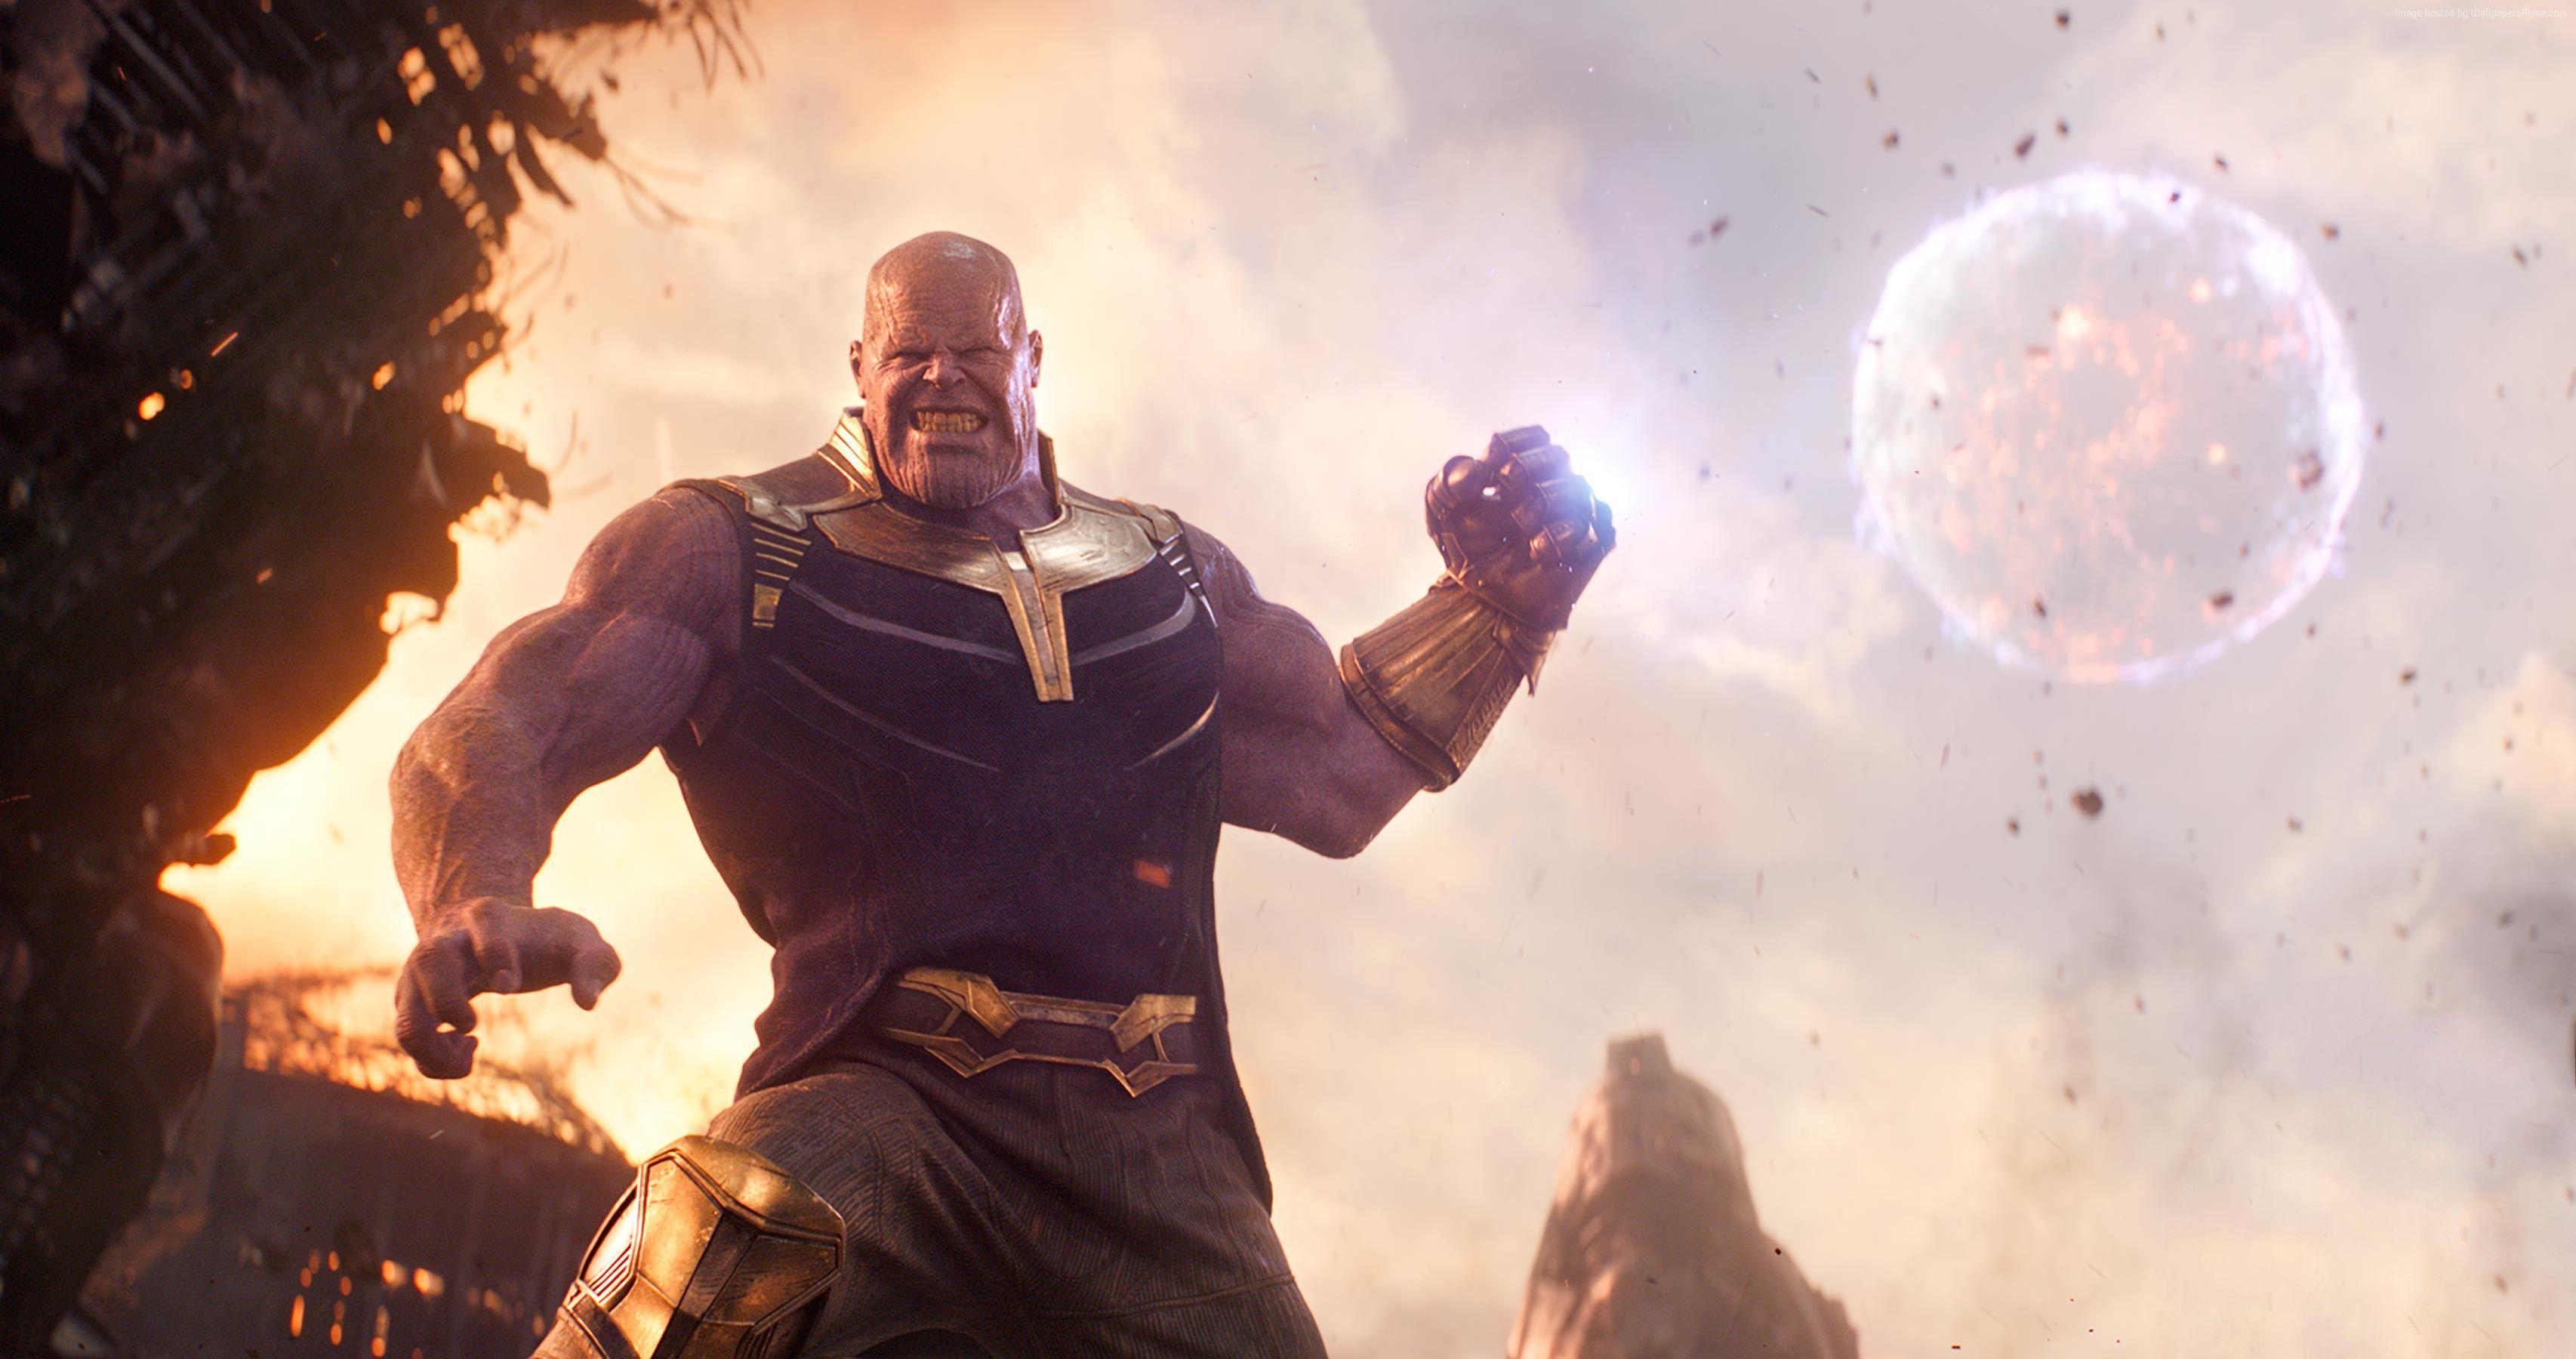 Avengers Infinity War Ipad Wallpapers Top Free Avengers Infinity